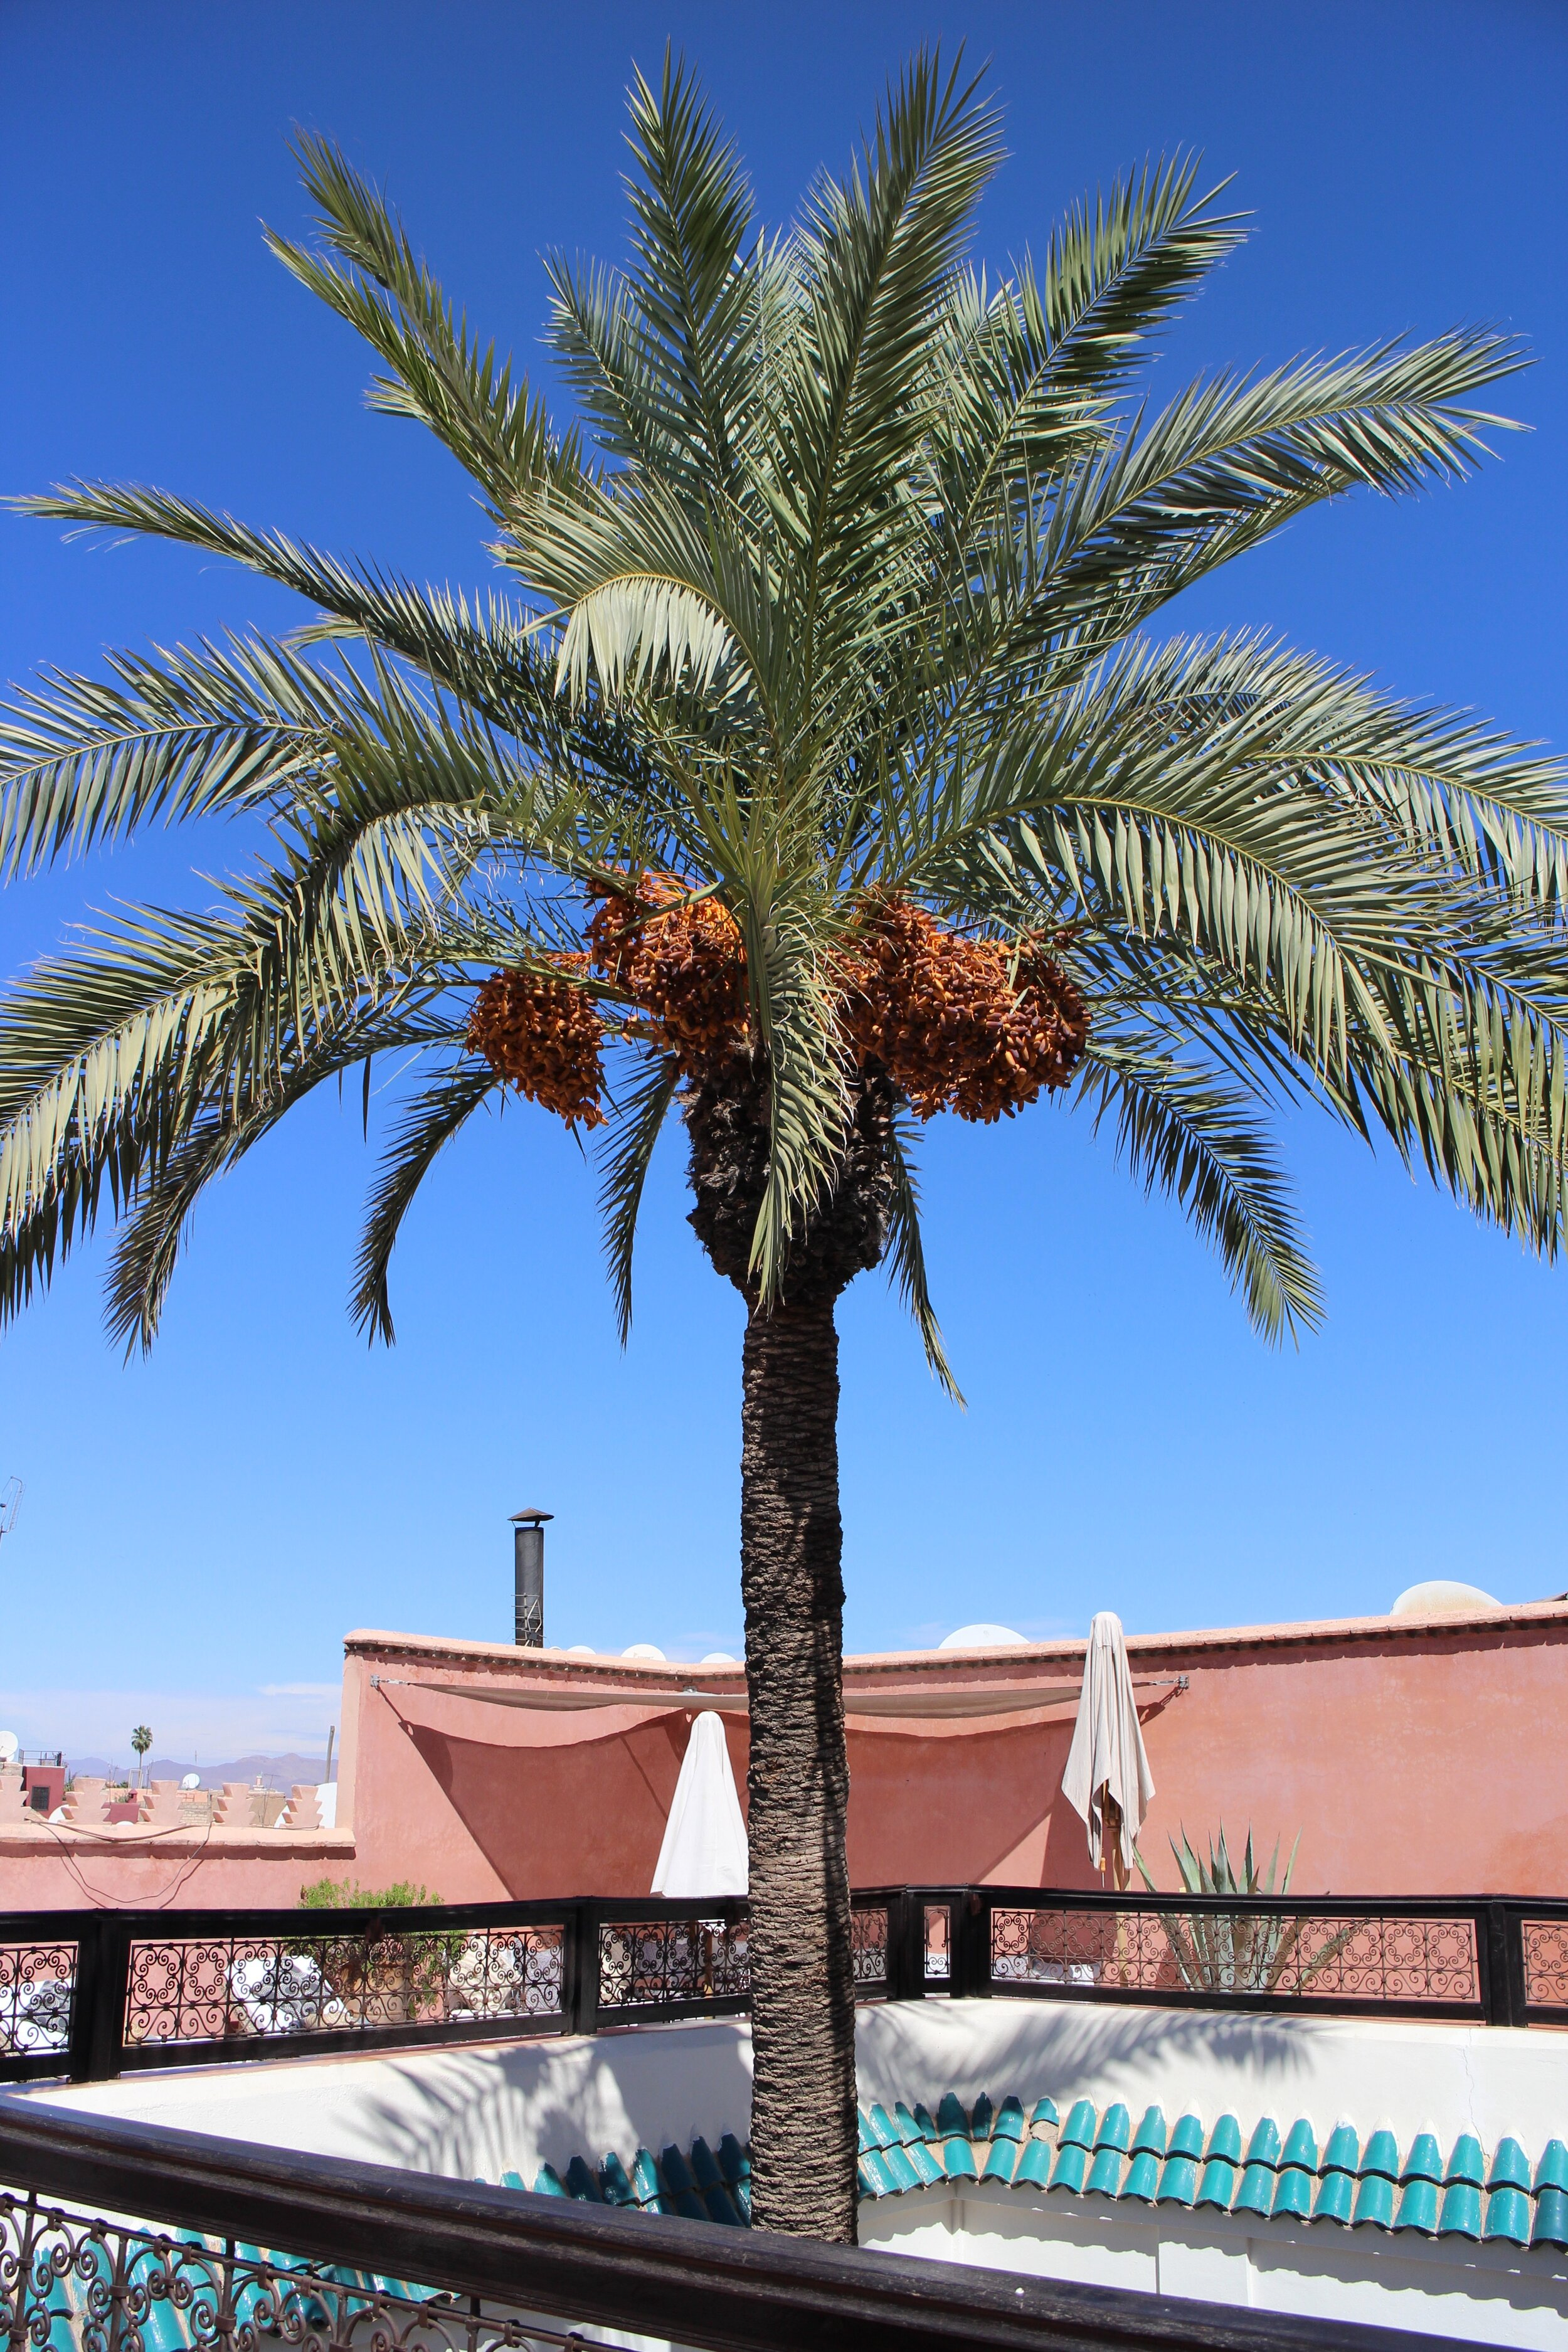 riad-zamzam-marrakech-spa-morocco-luxury-holiday-10